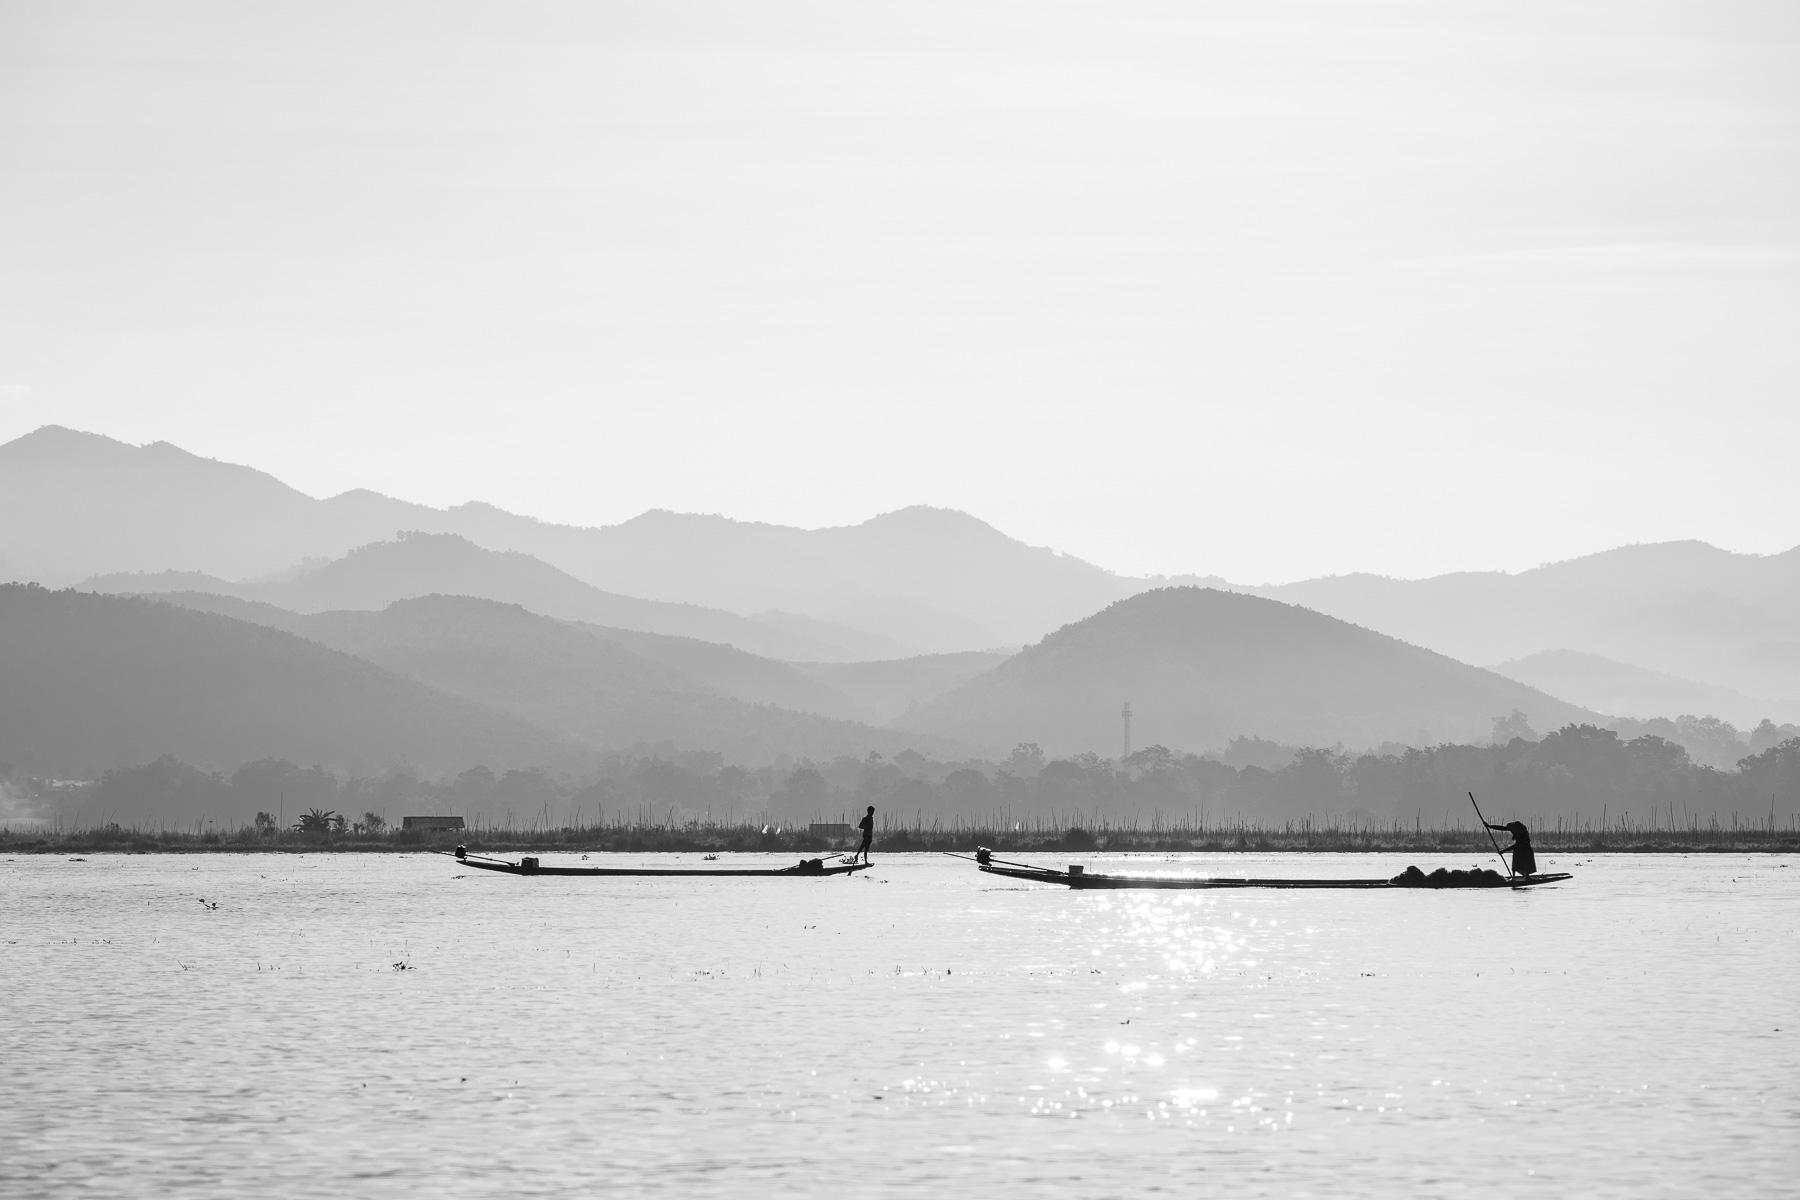 Christian Meixner Fotografie, Fotograf Zürich, Myanmar, Inle Lake, Fischer, Reisen, Reisefotografie